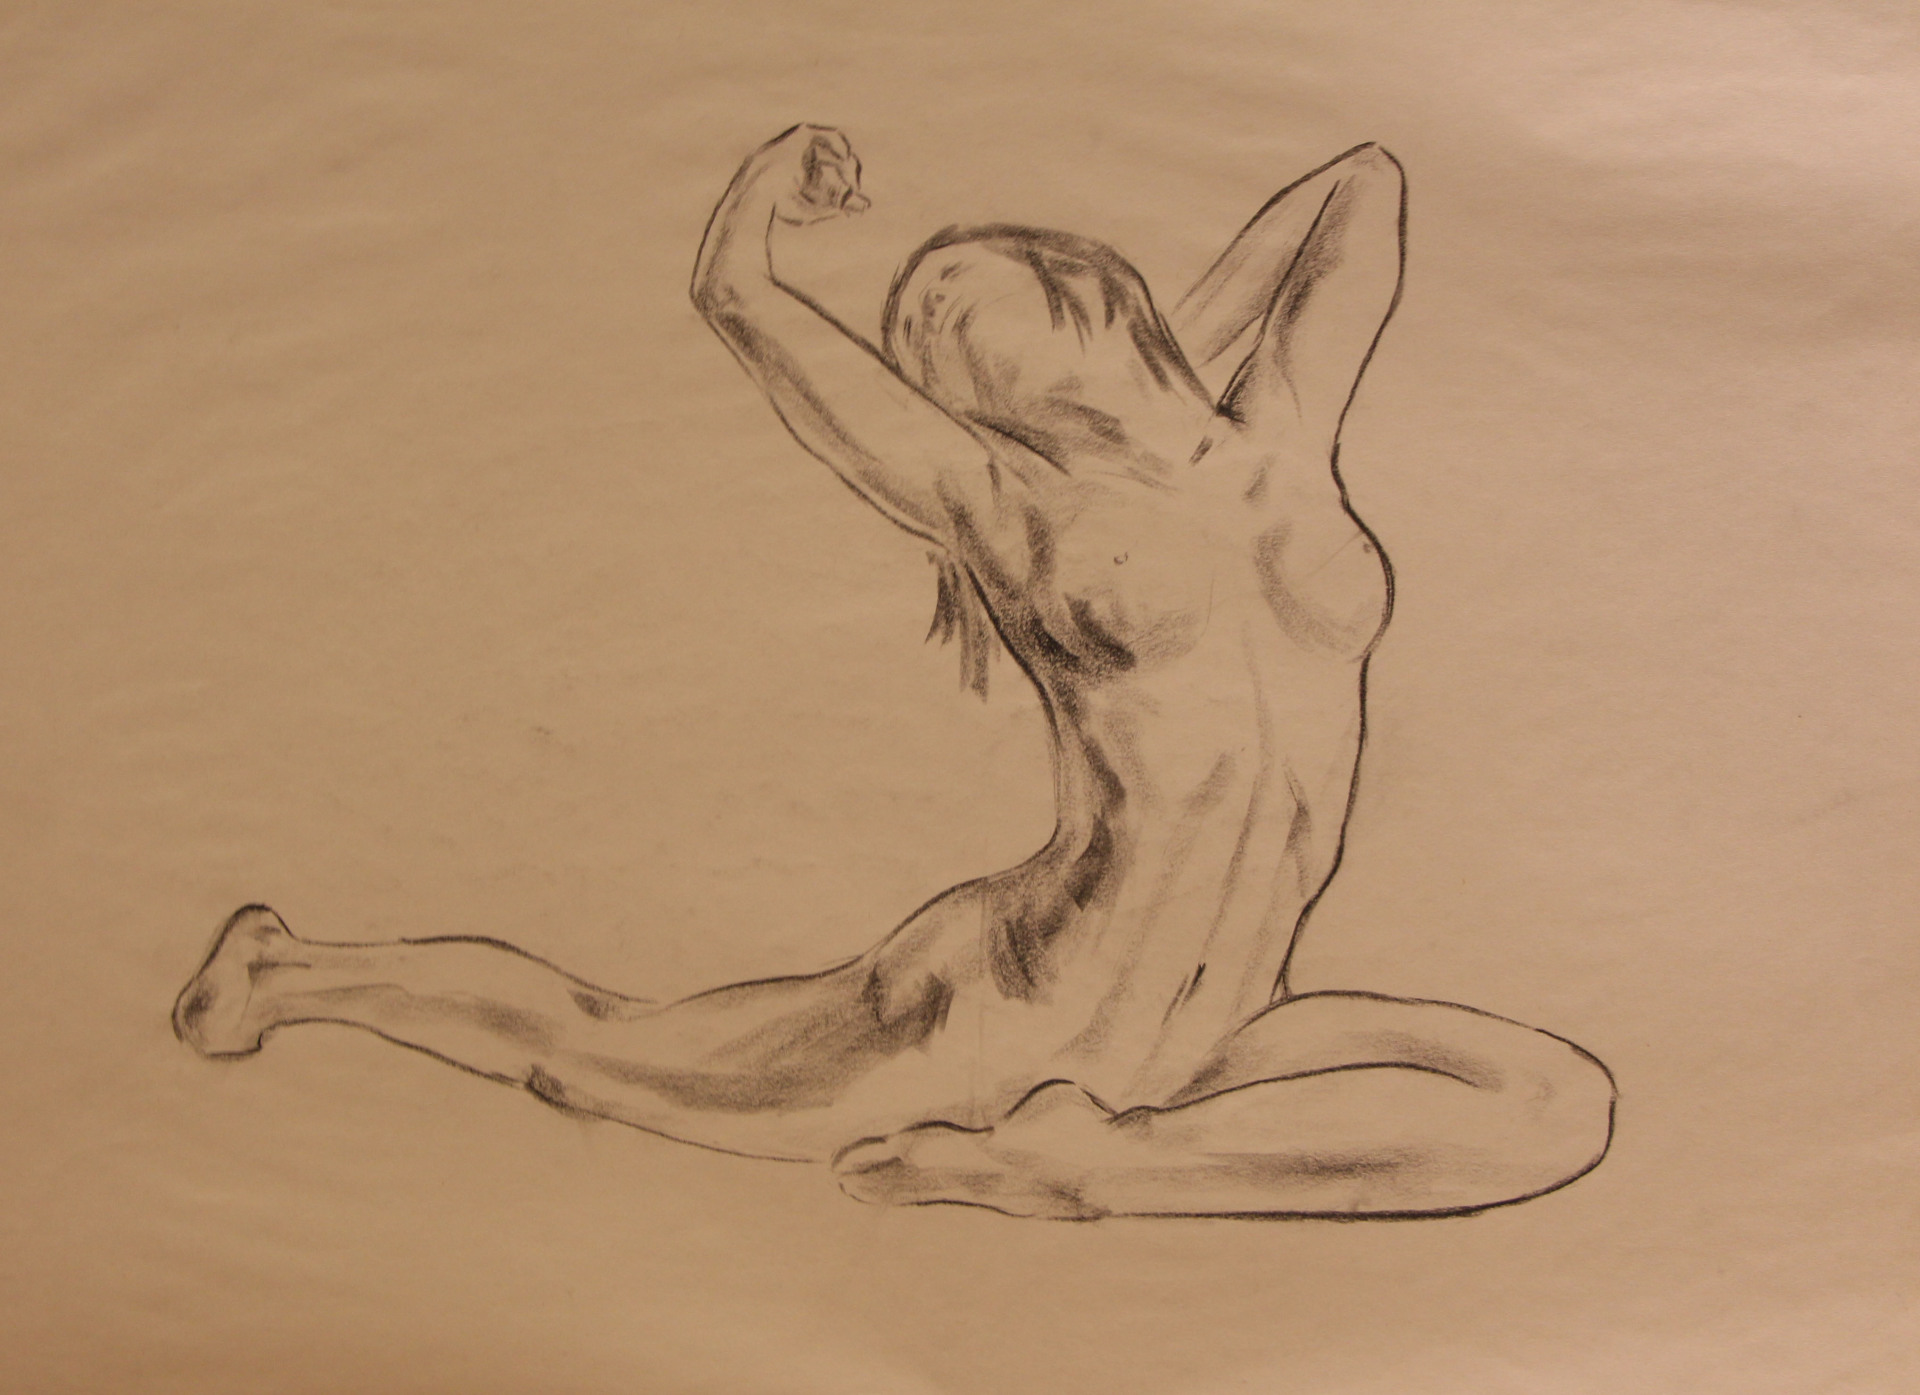 Anatomy Study - Women